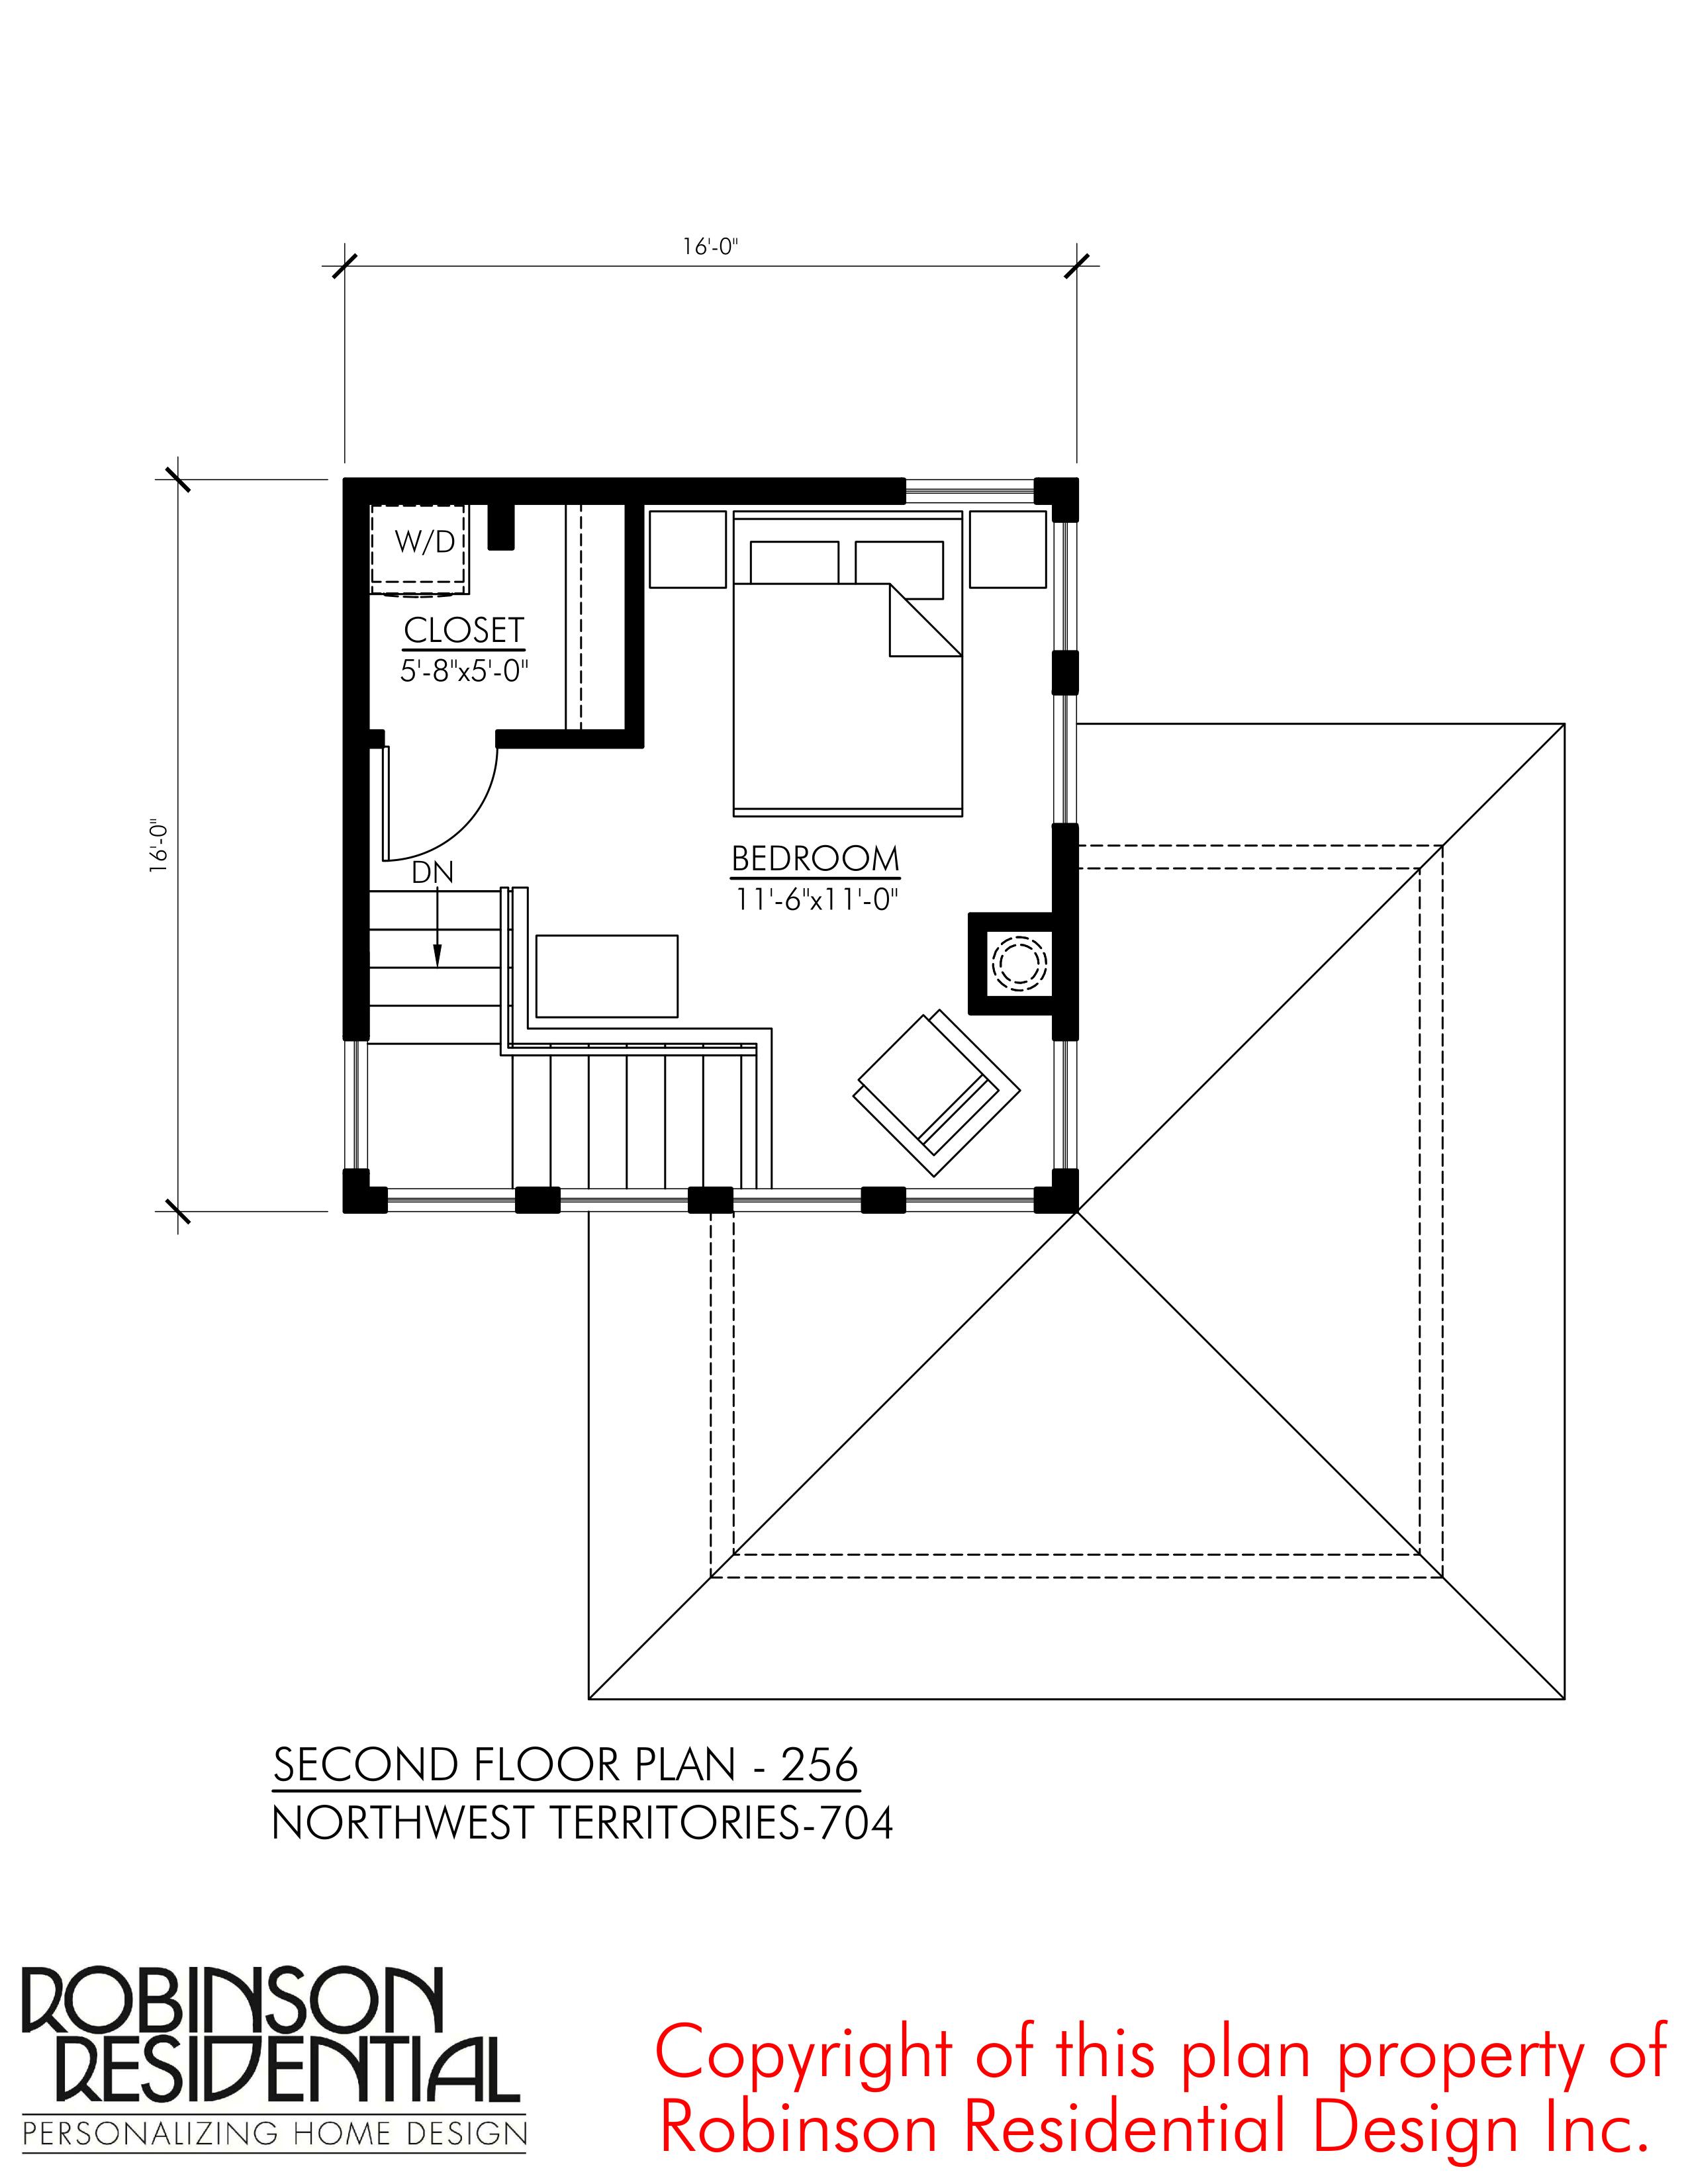 Tiny Home Designs: Northwest Territories-704